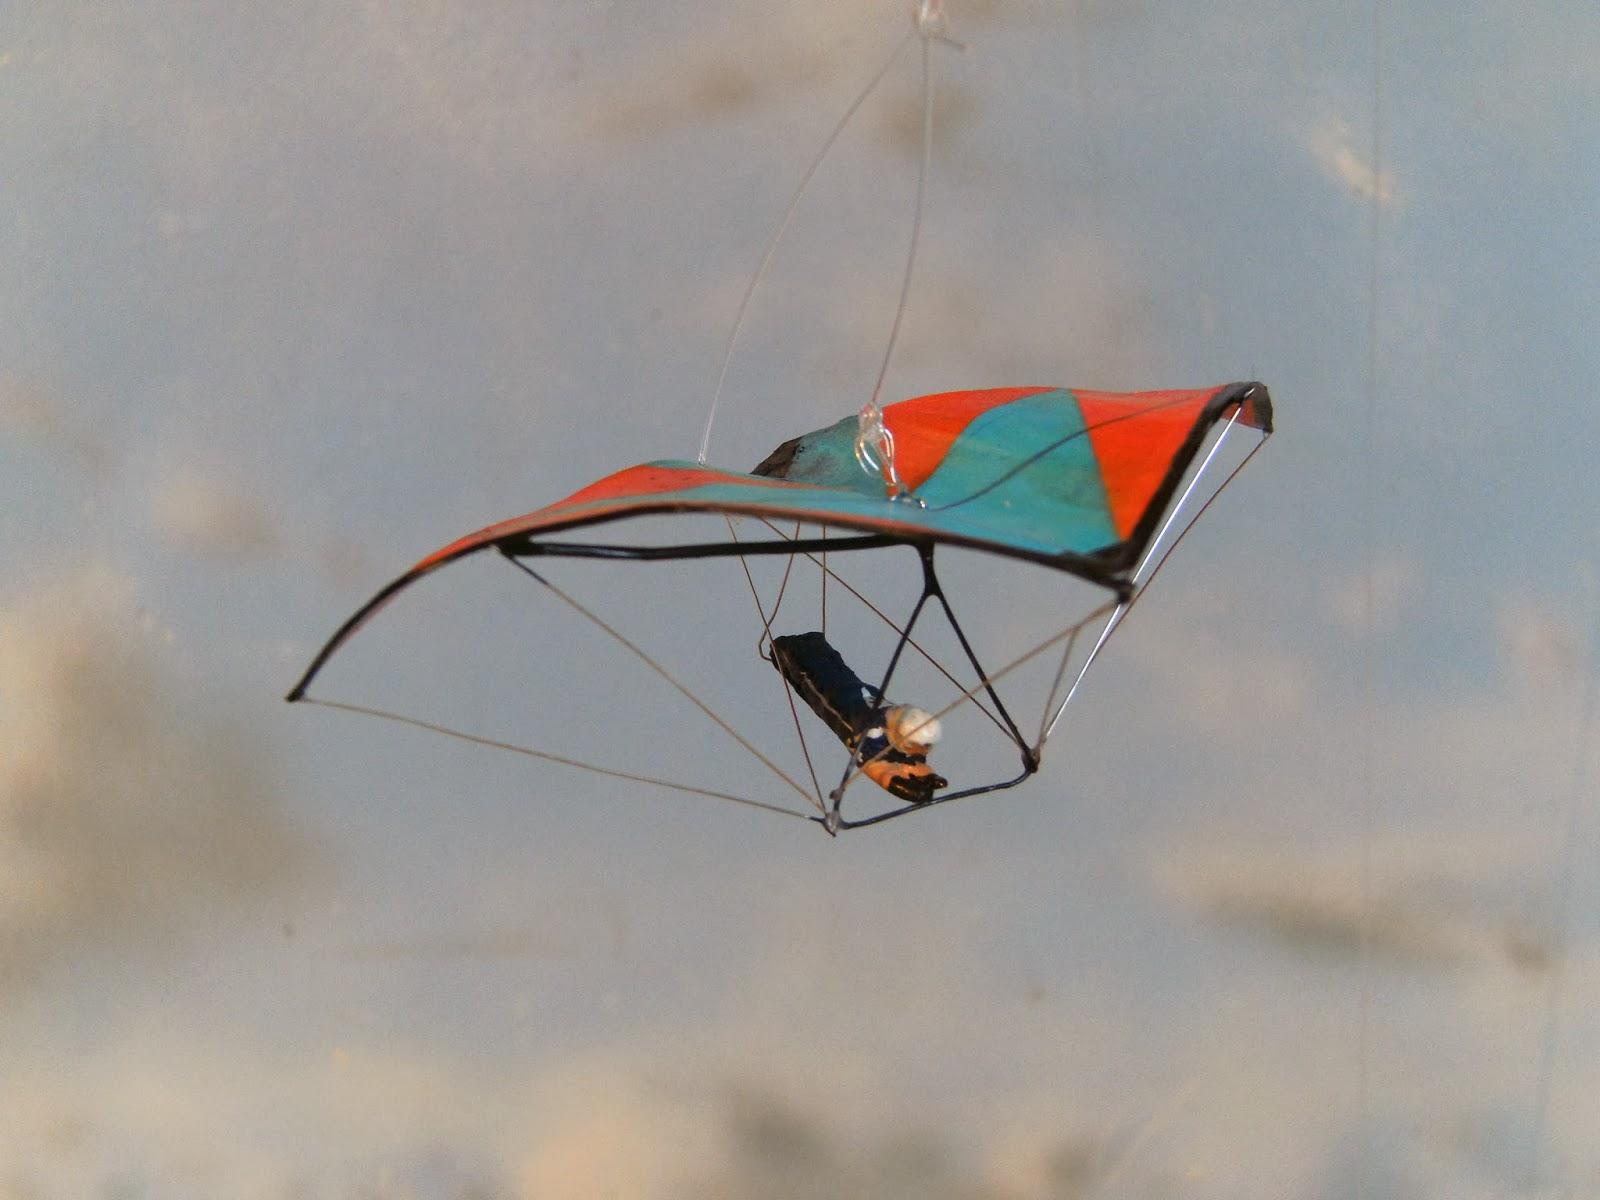 Happyscale-Modellbau: Drachenflieger / hang-glider